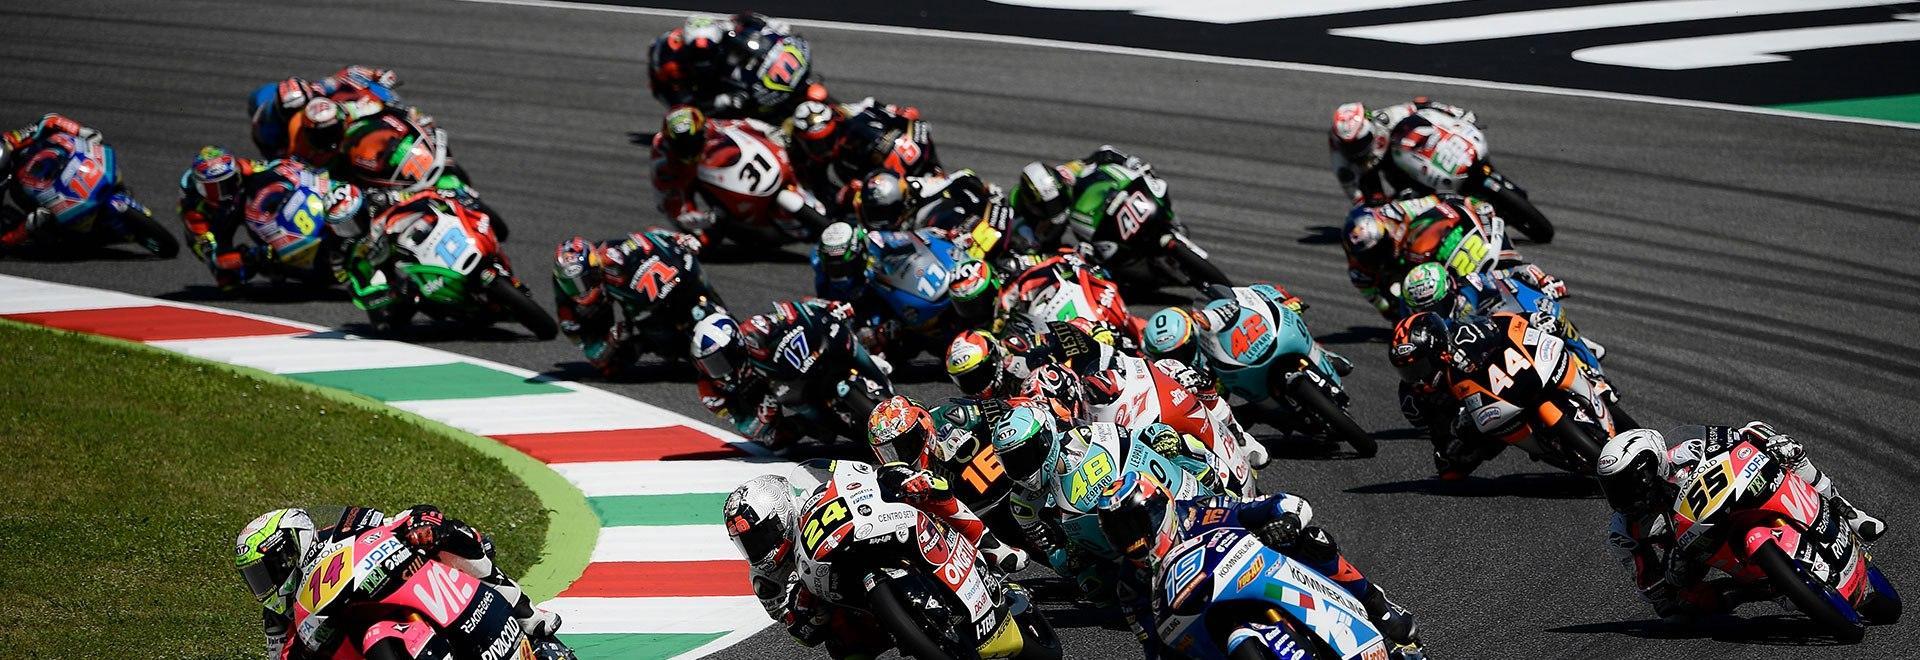 Moto3 Vallelunga. Race 1